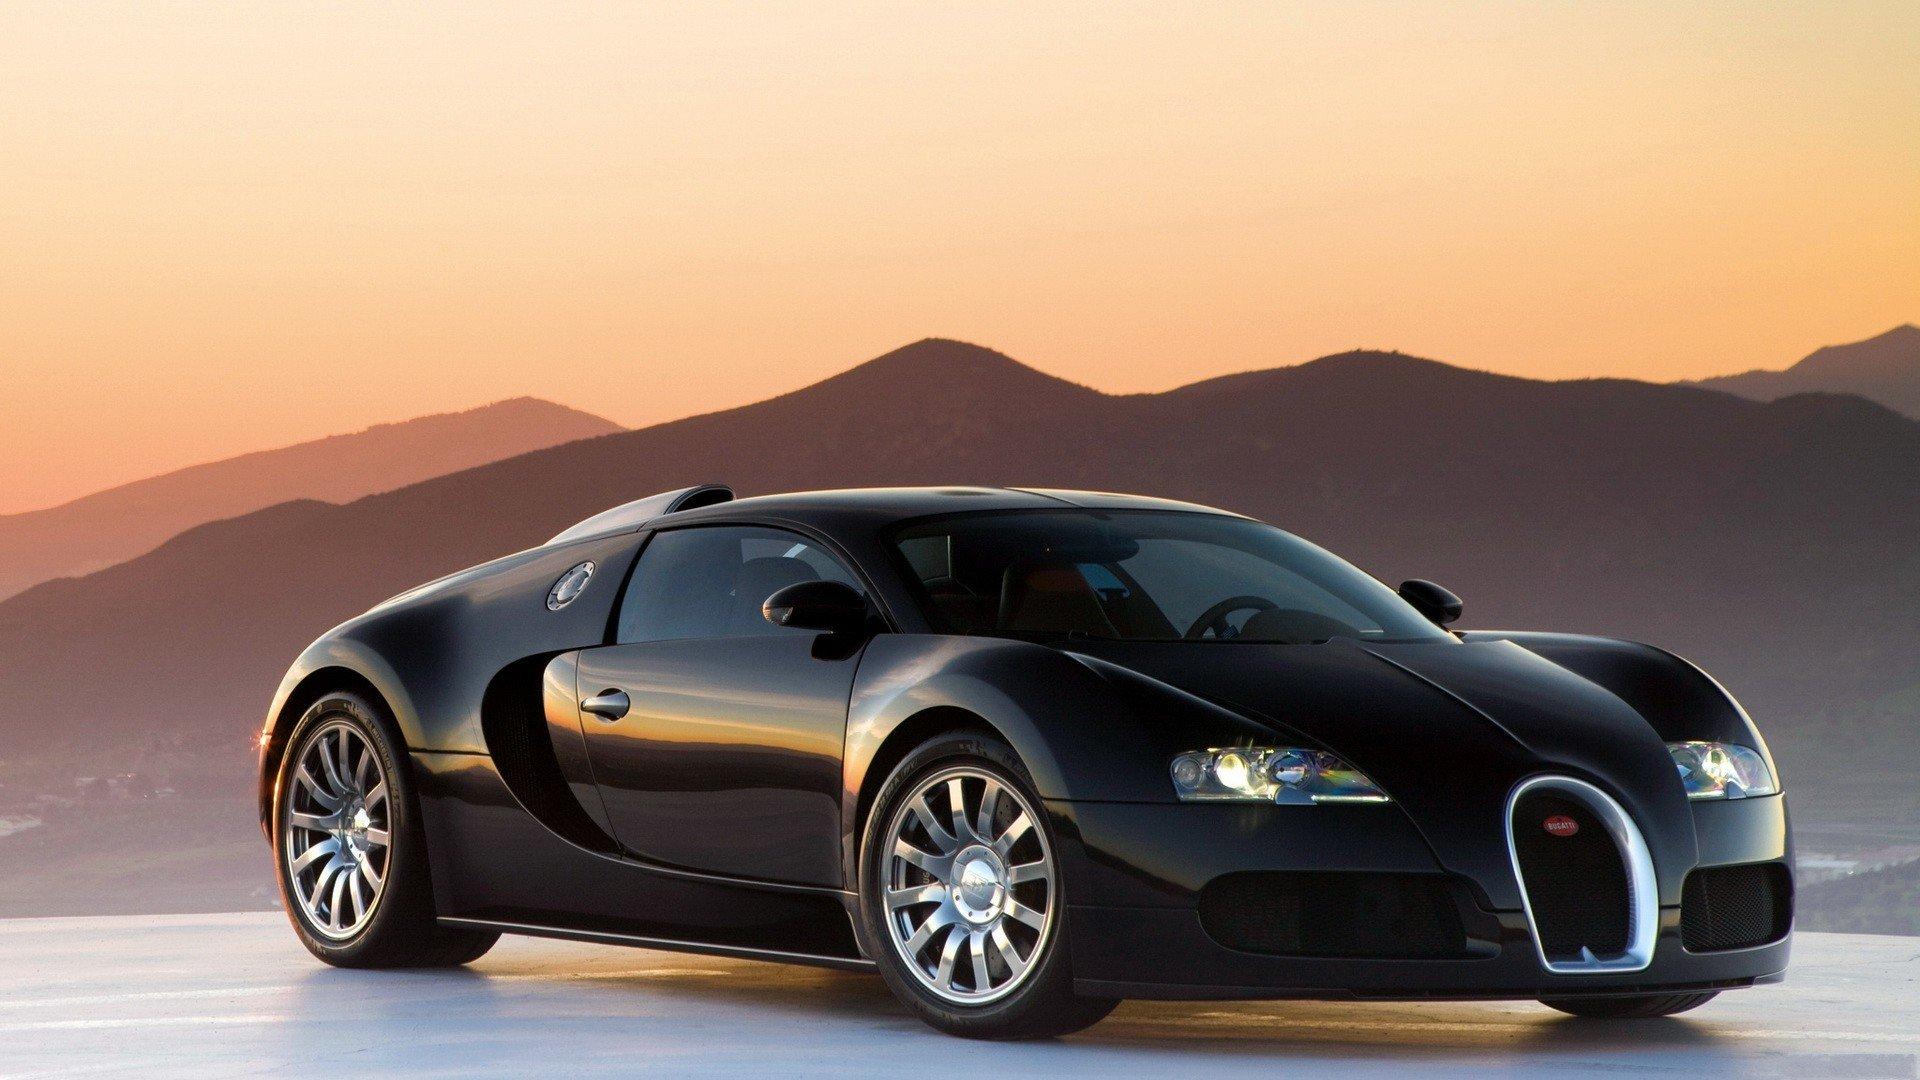 Image Result For Mac Wallpaper Bugatti Veyron Bugatti Veyron Bugatti Veyron